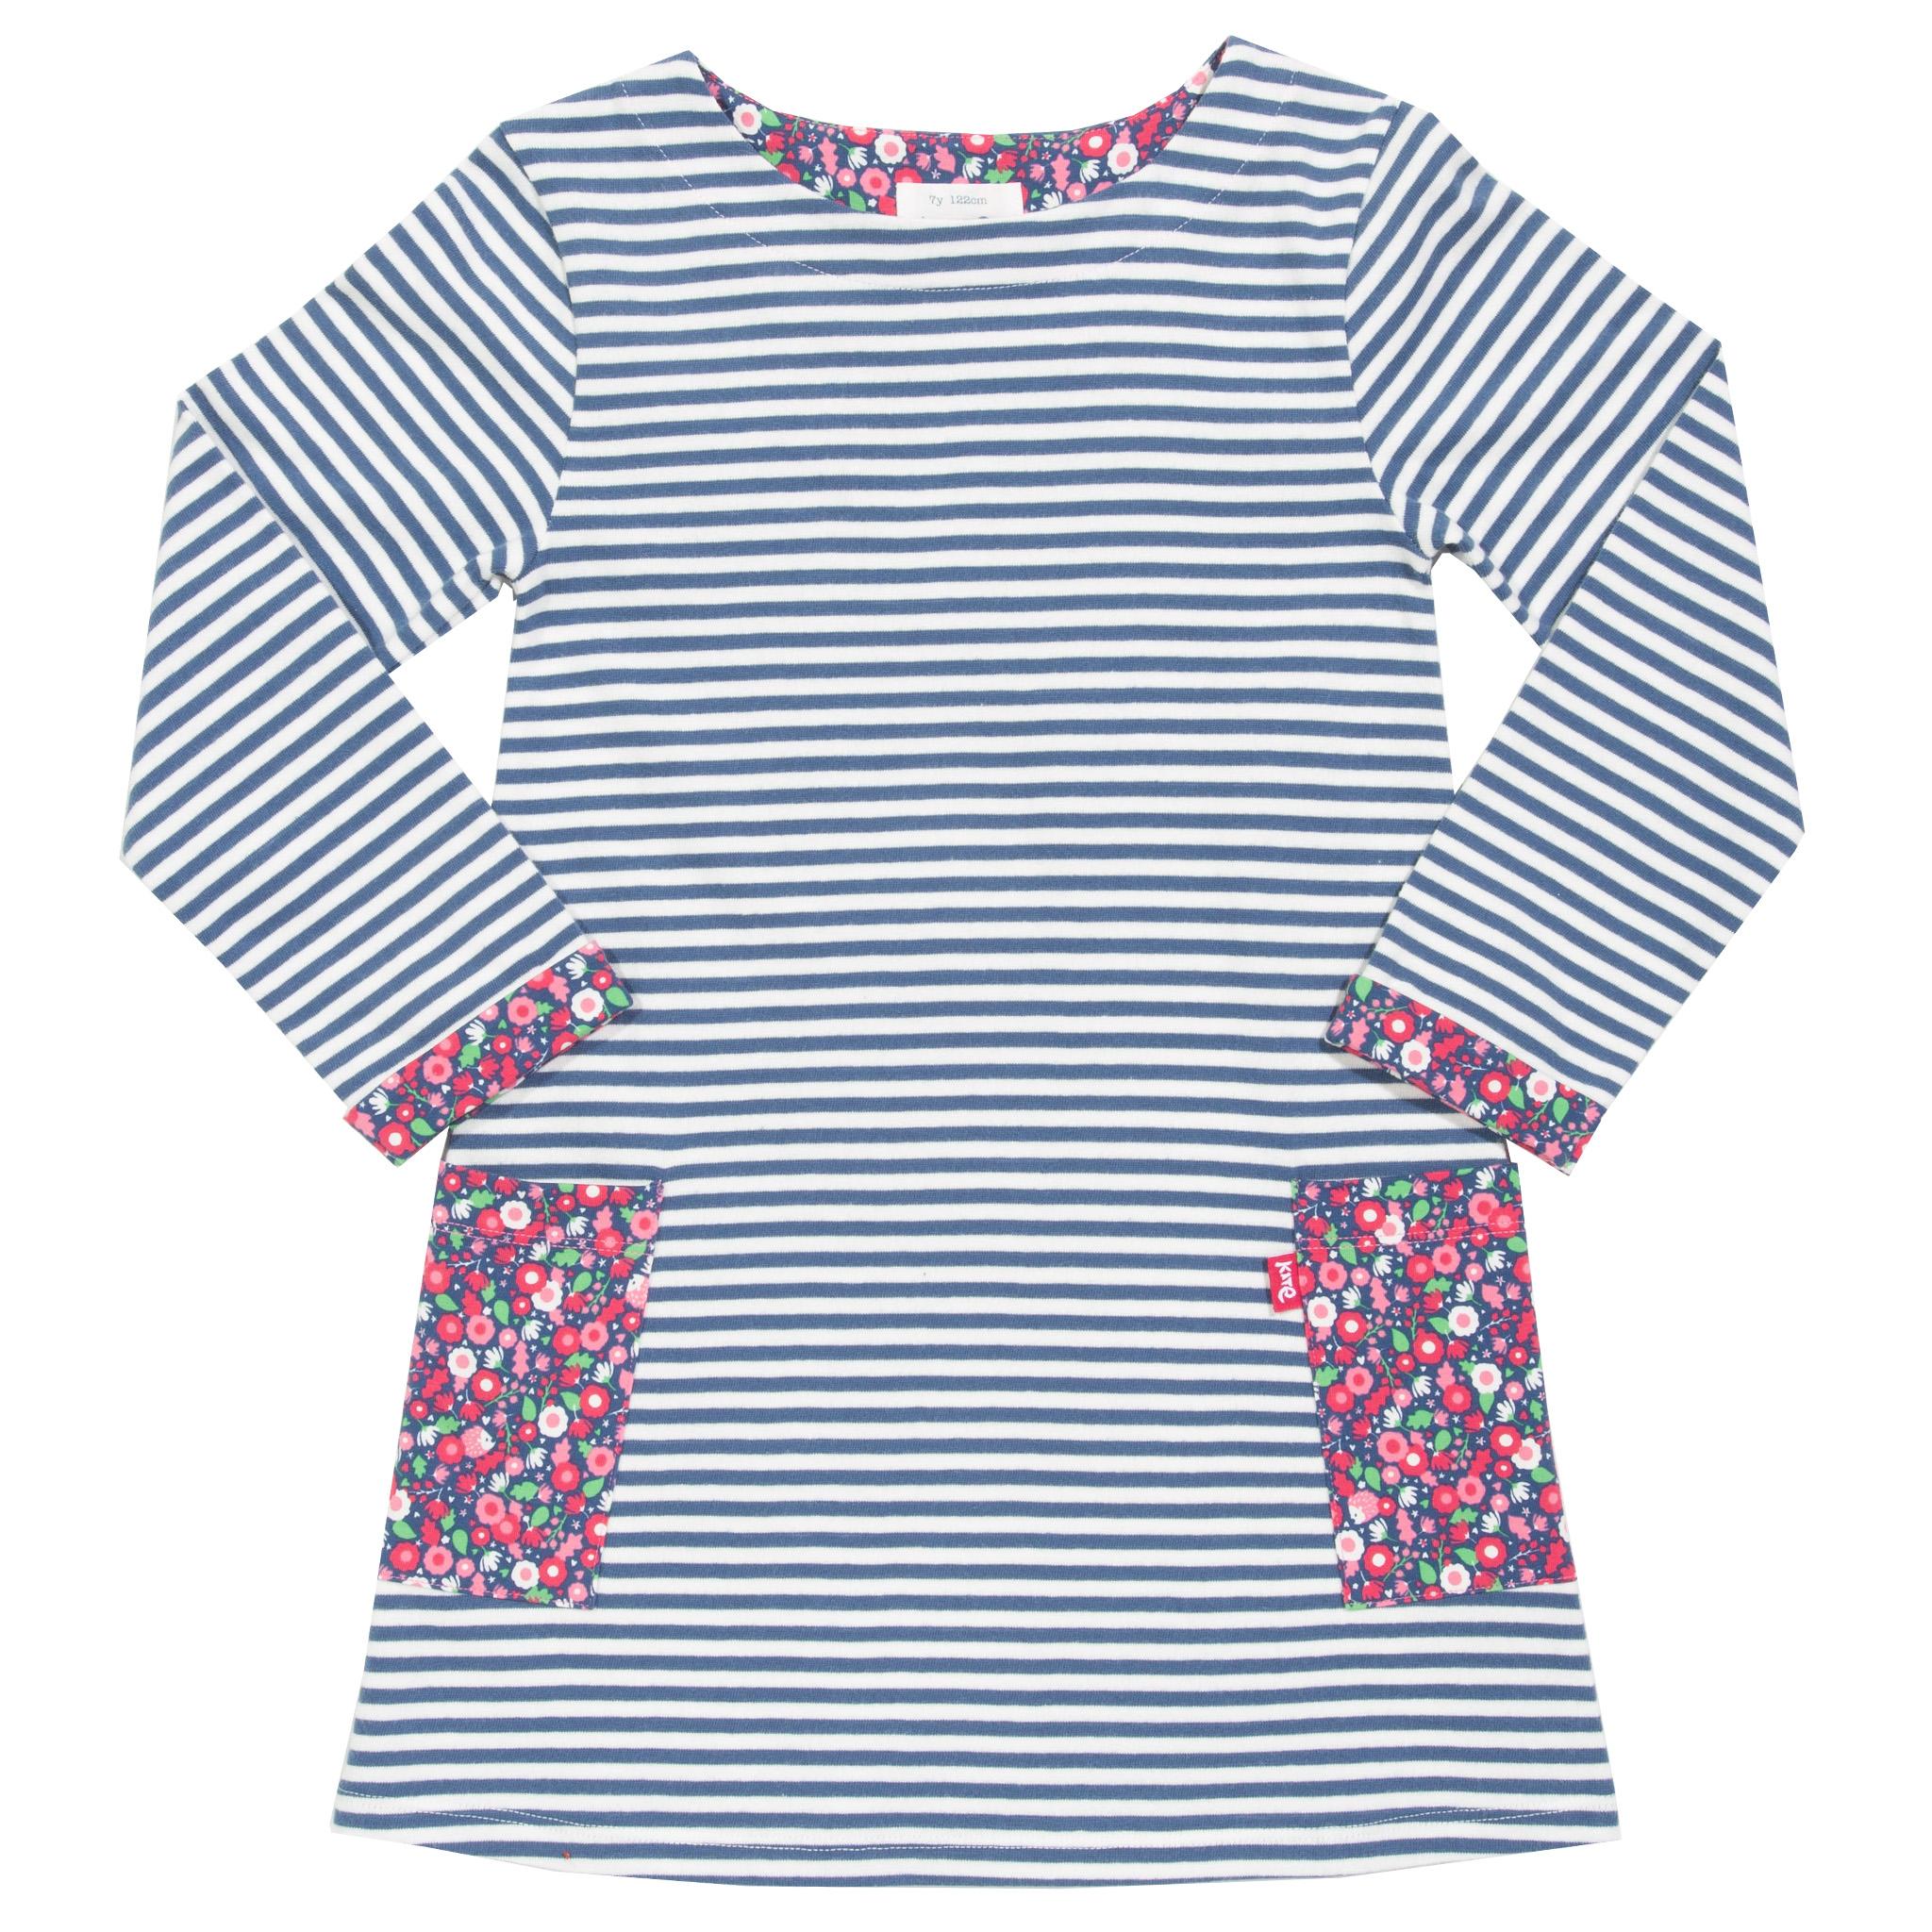 Kite Durdle Door Dress-Navy & White Stripe